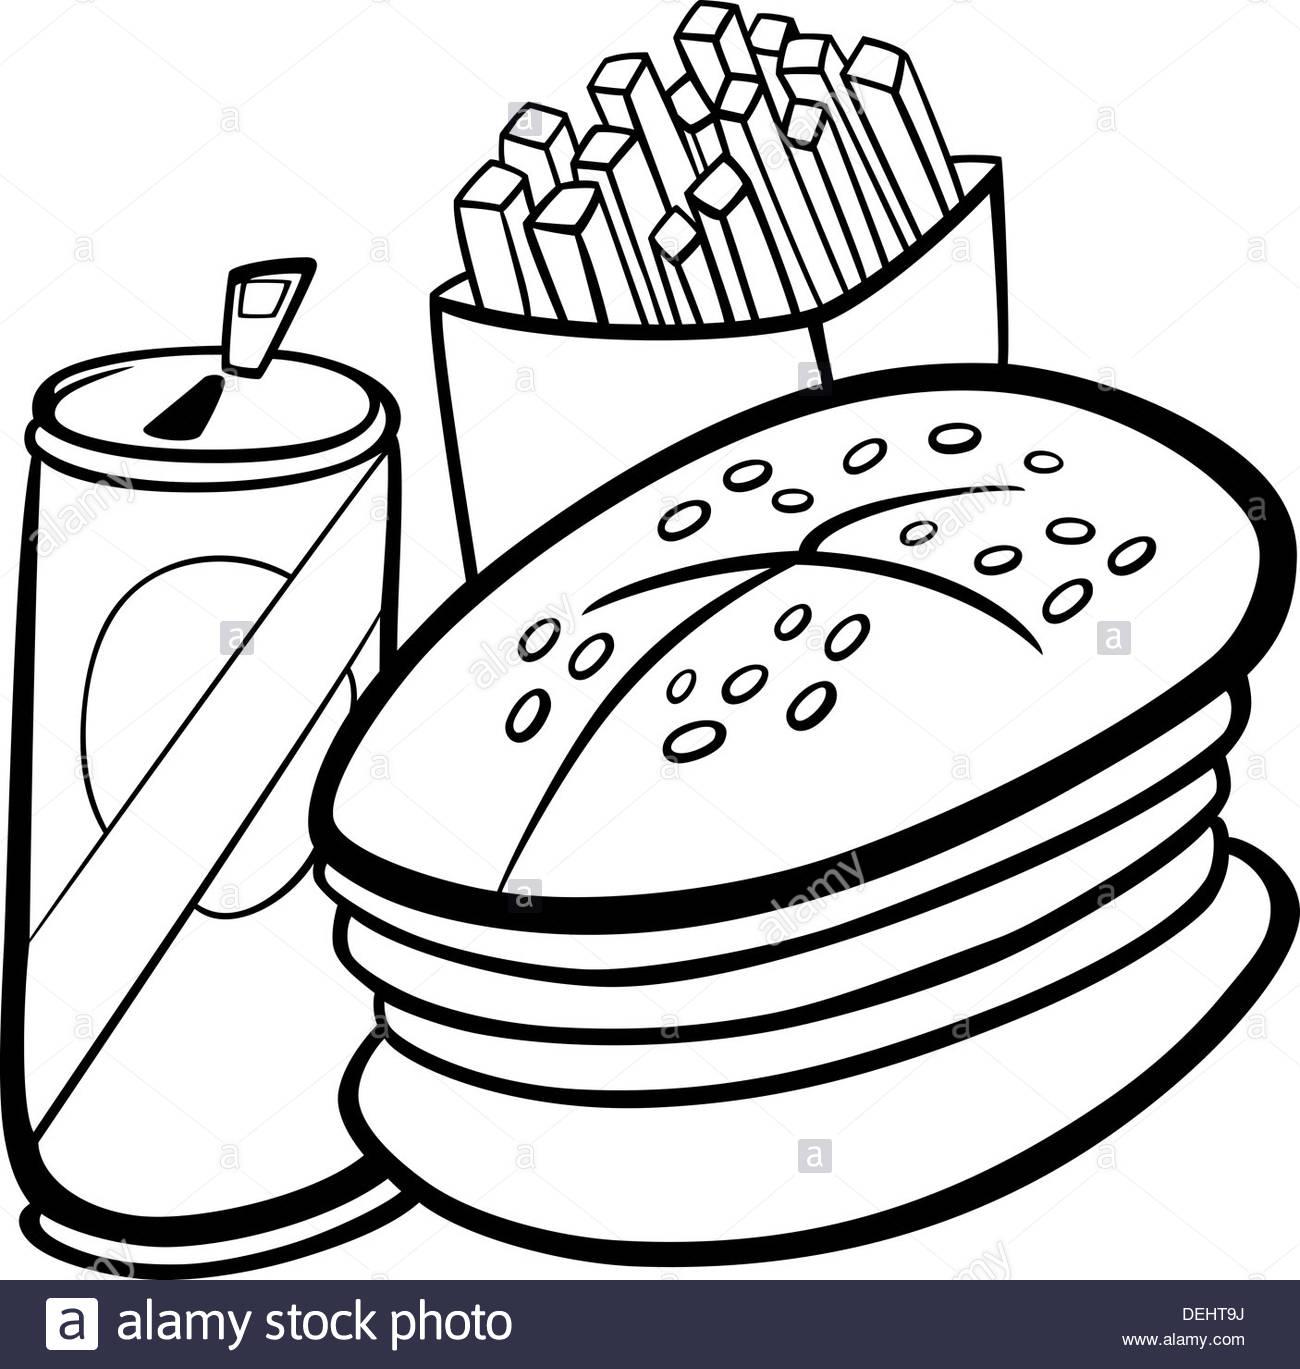 1300x1369 Black And White Cartoon Illustration Of Fast Food Set